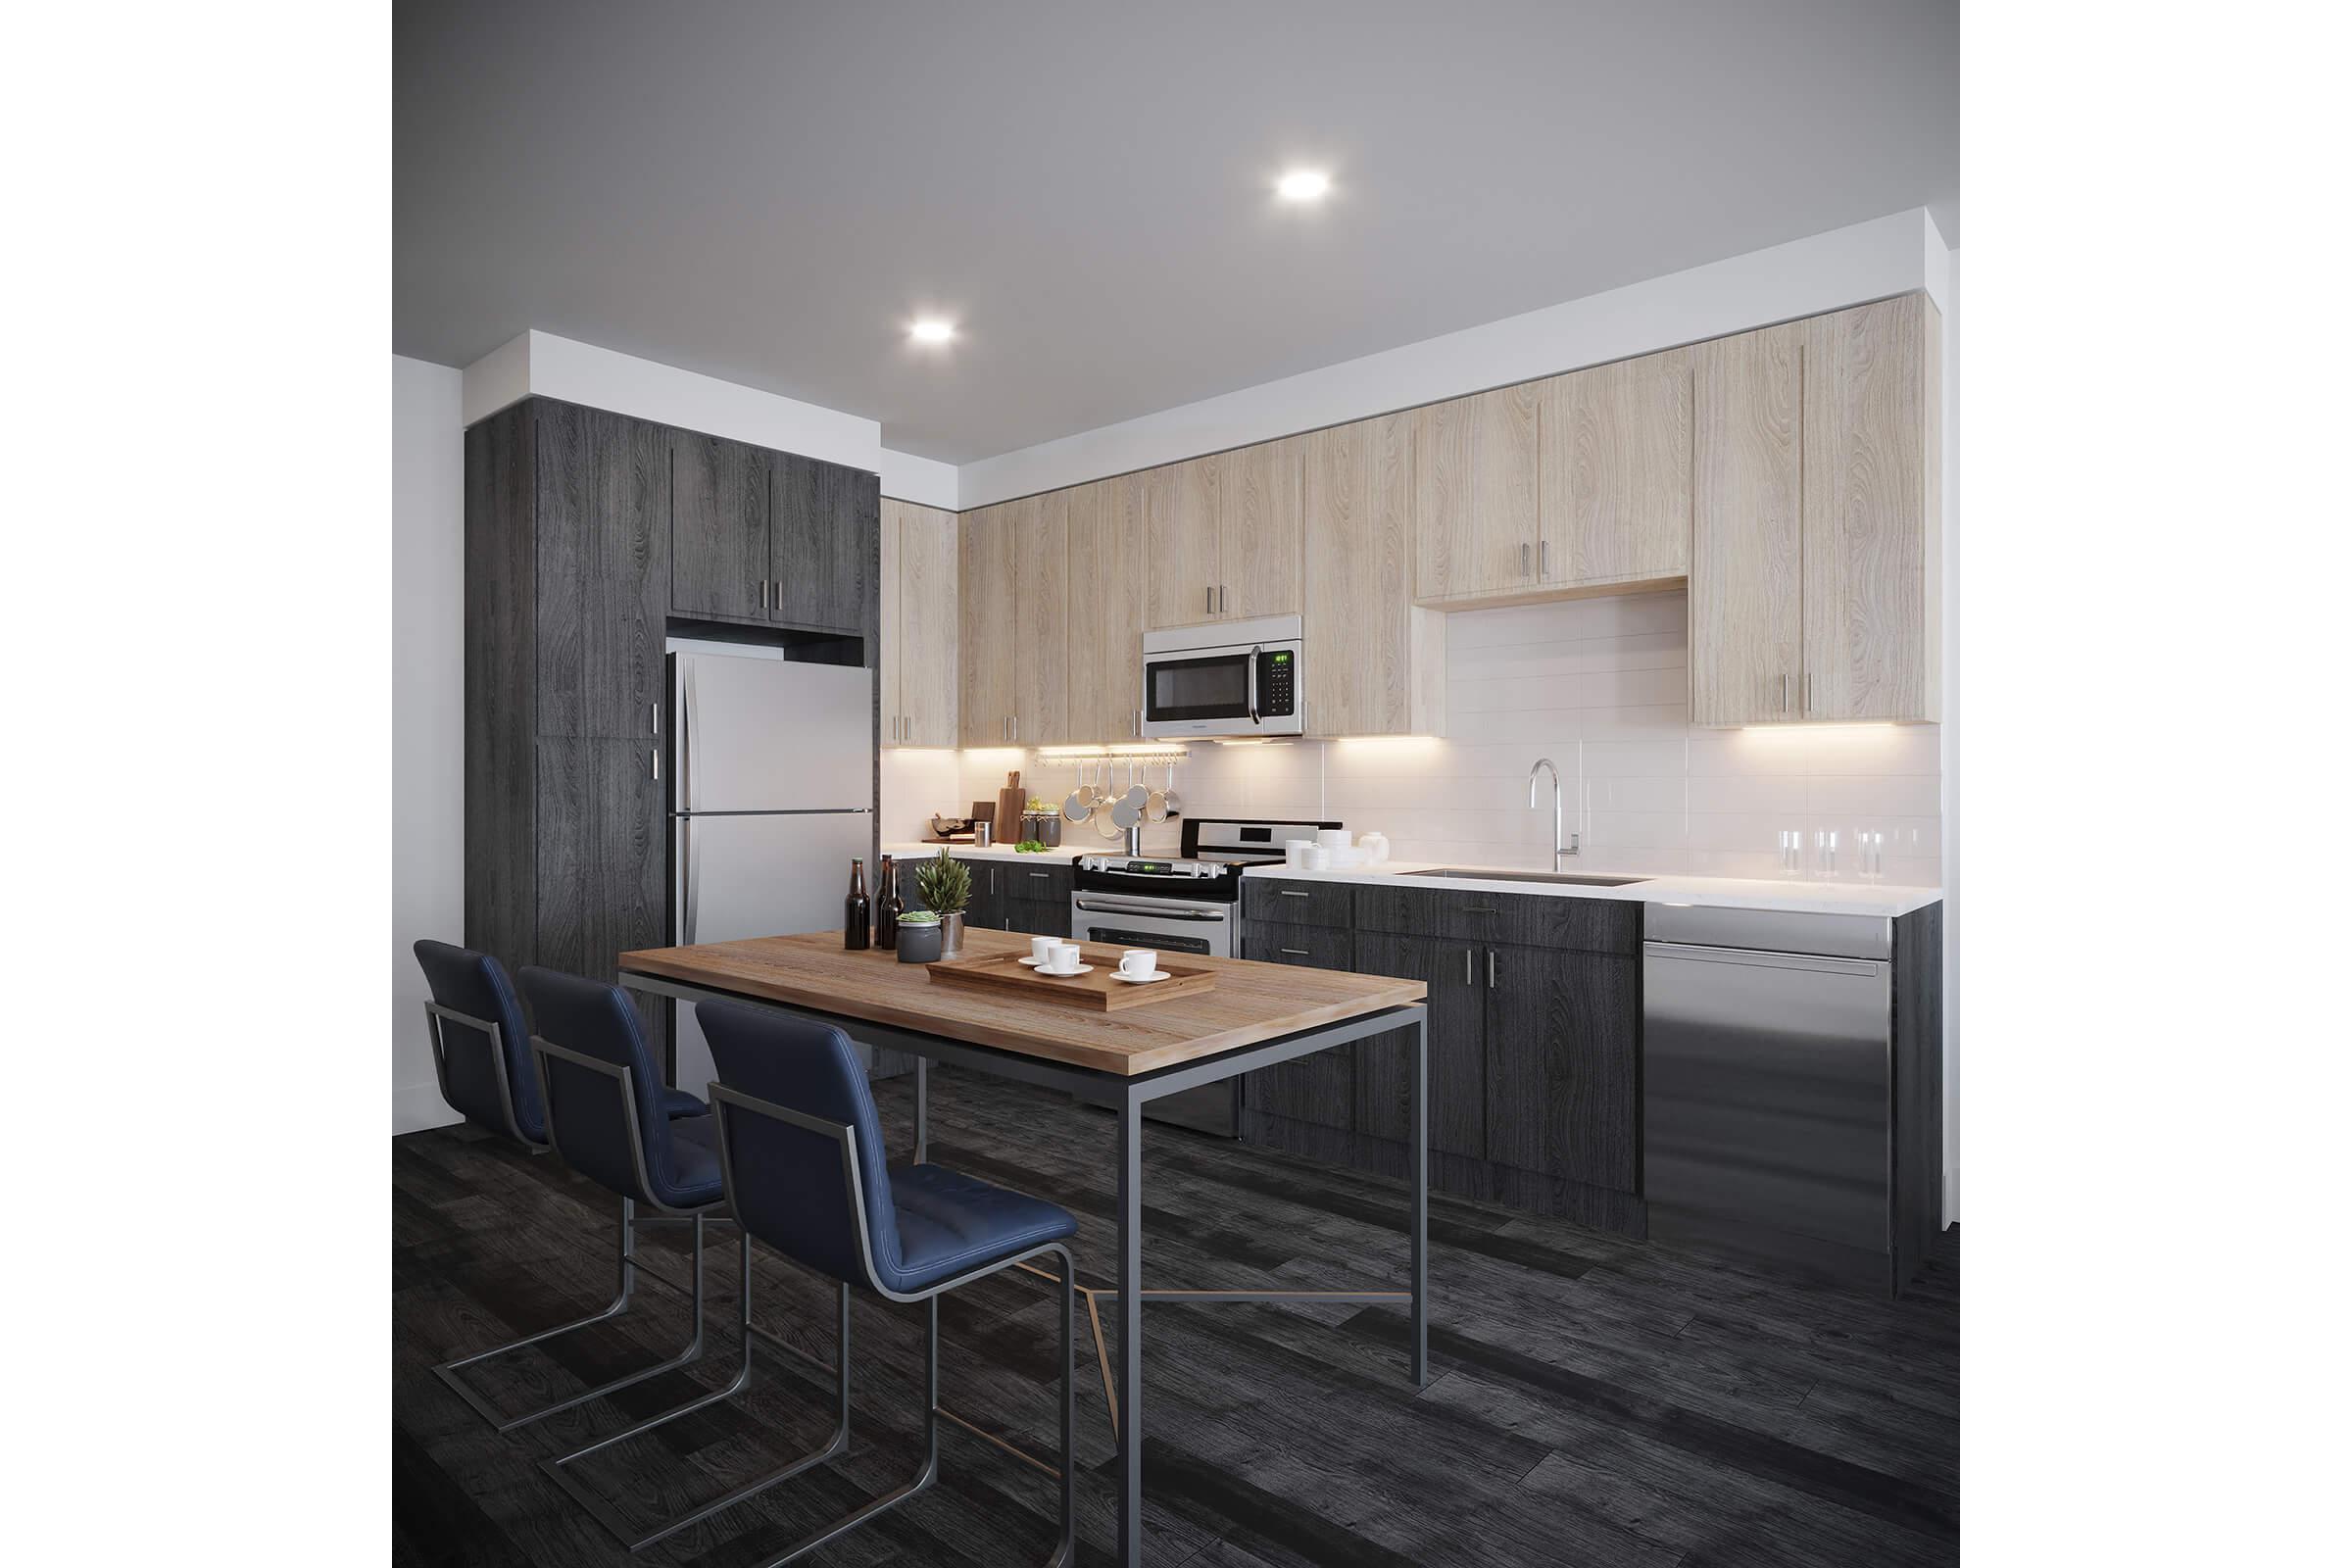 a kitchen counter